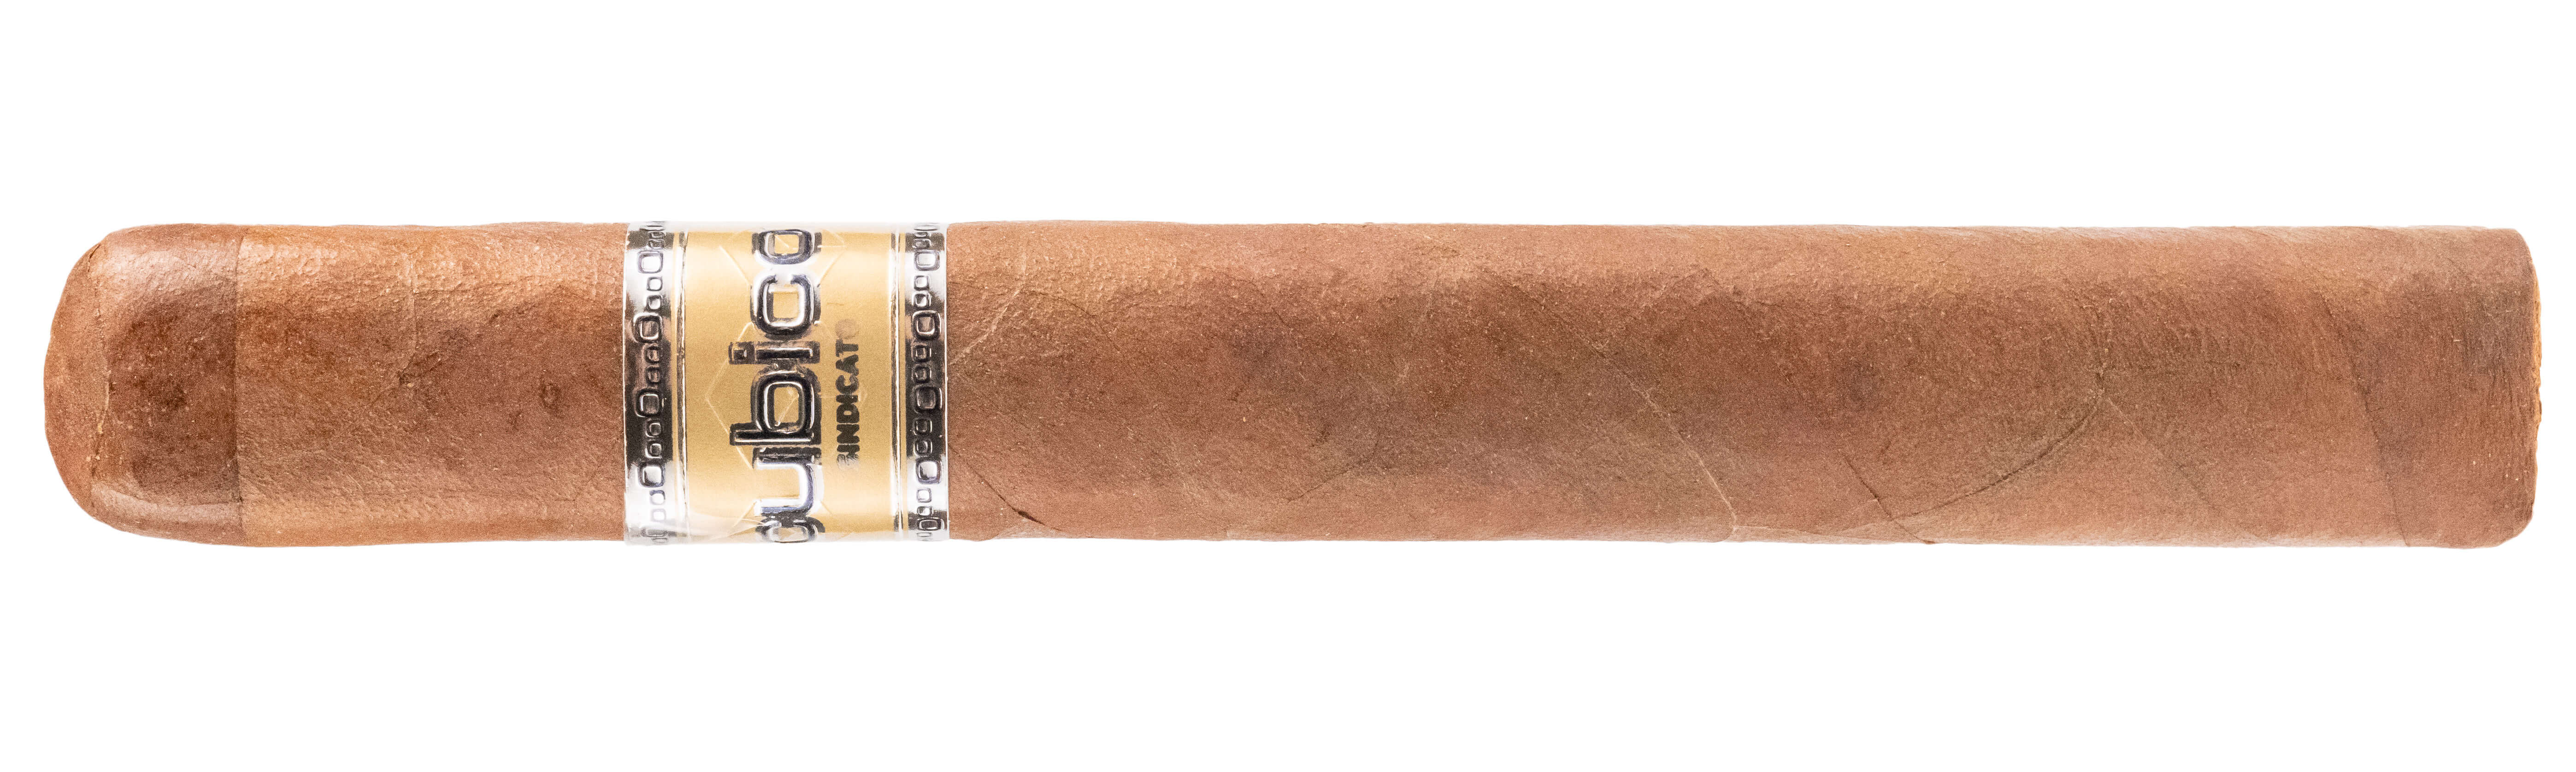 Blind Cigar Review: Sindicato | Cubico Toro